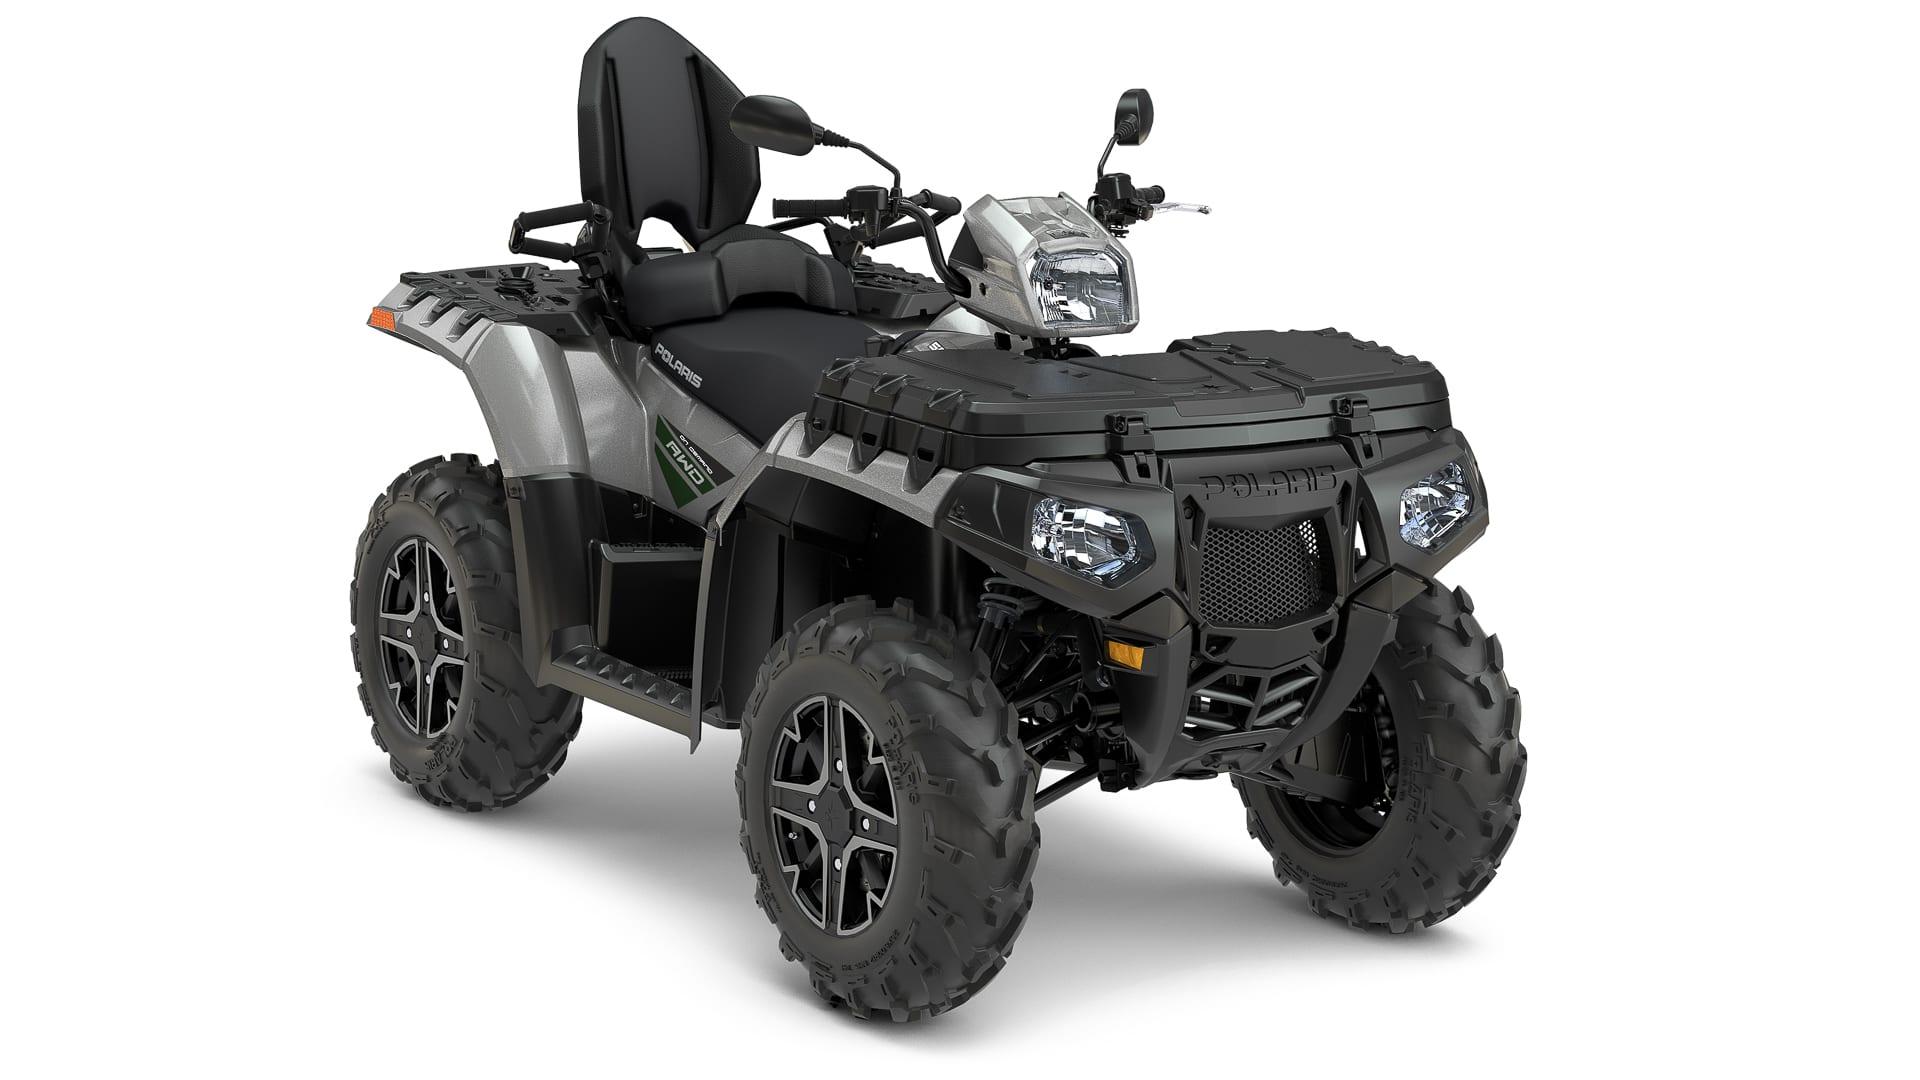 Side By Side Atv >> 2018 Polaris Sportsman ATV Lineup   ATV Trail Rider Magazine